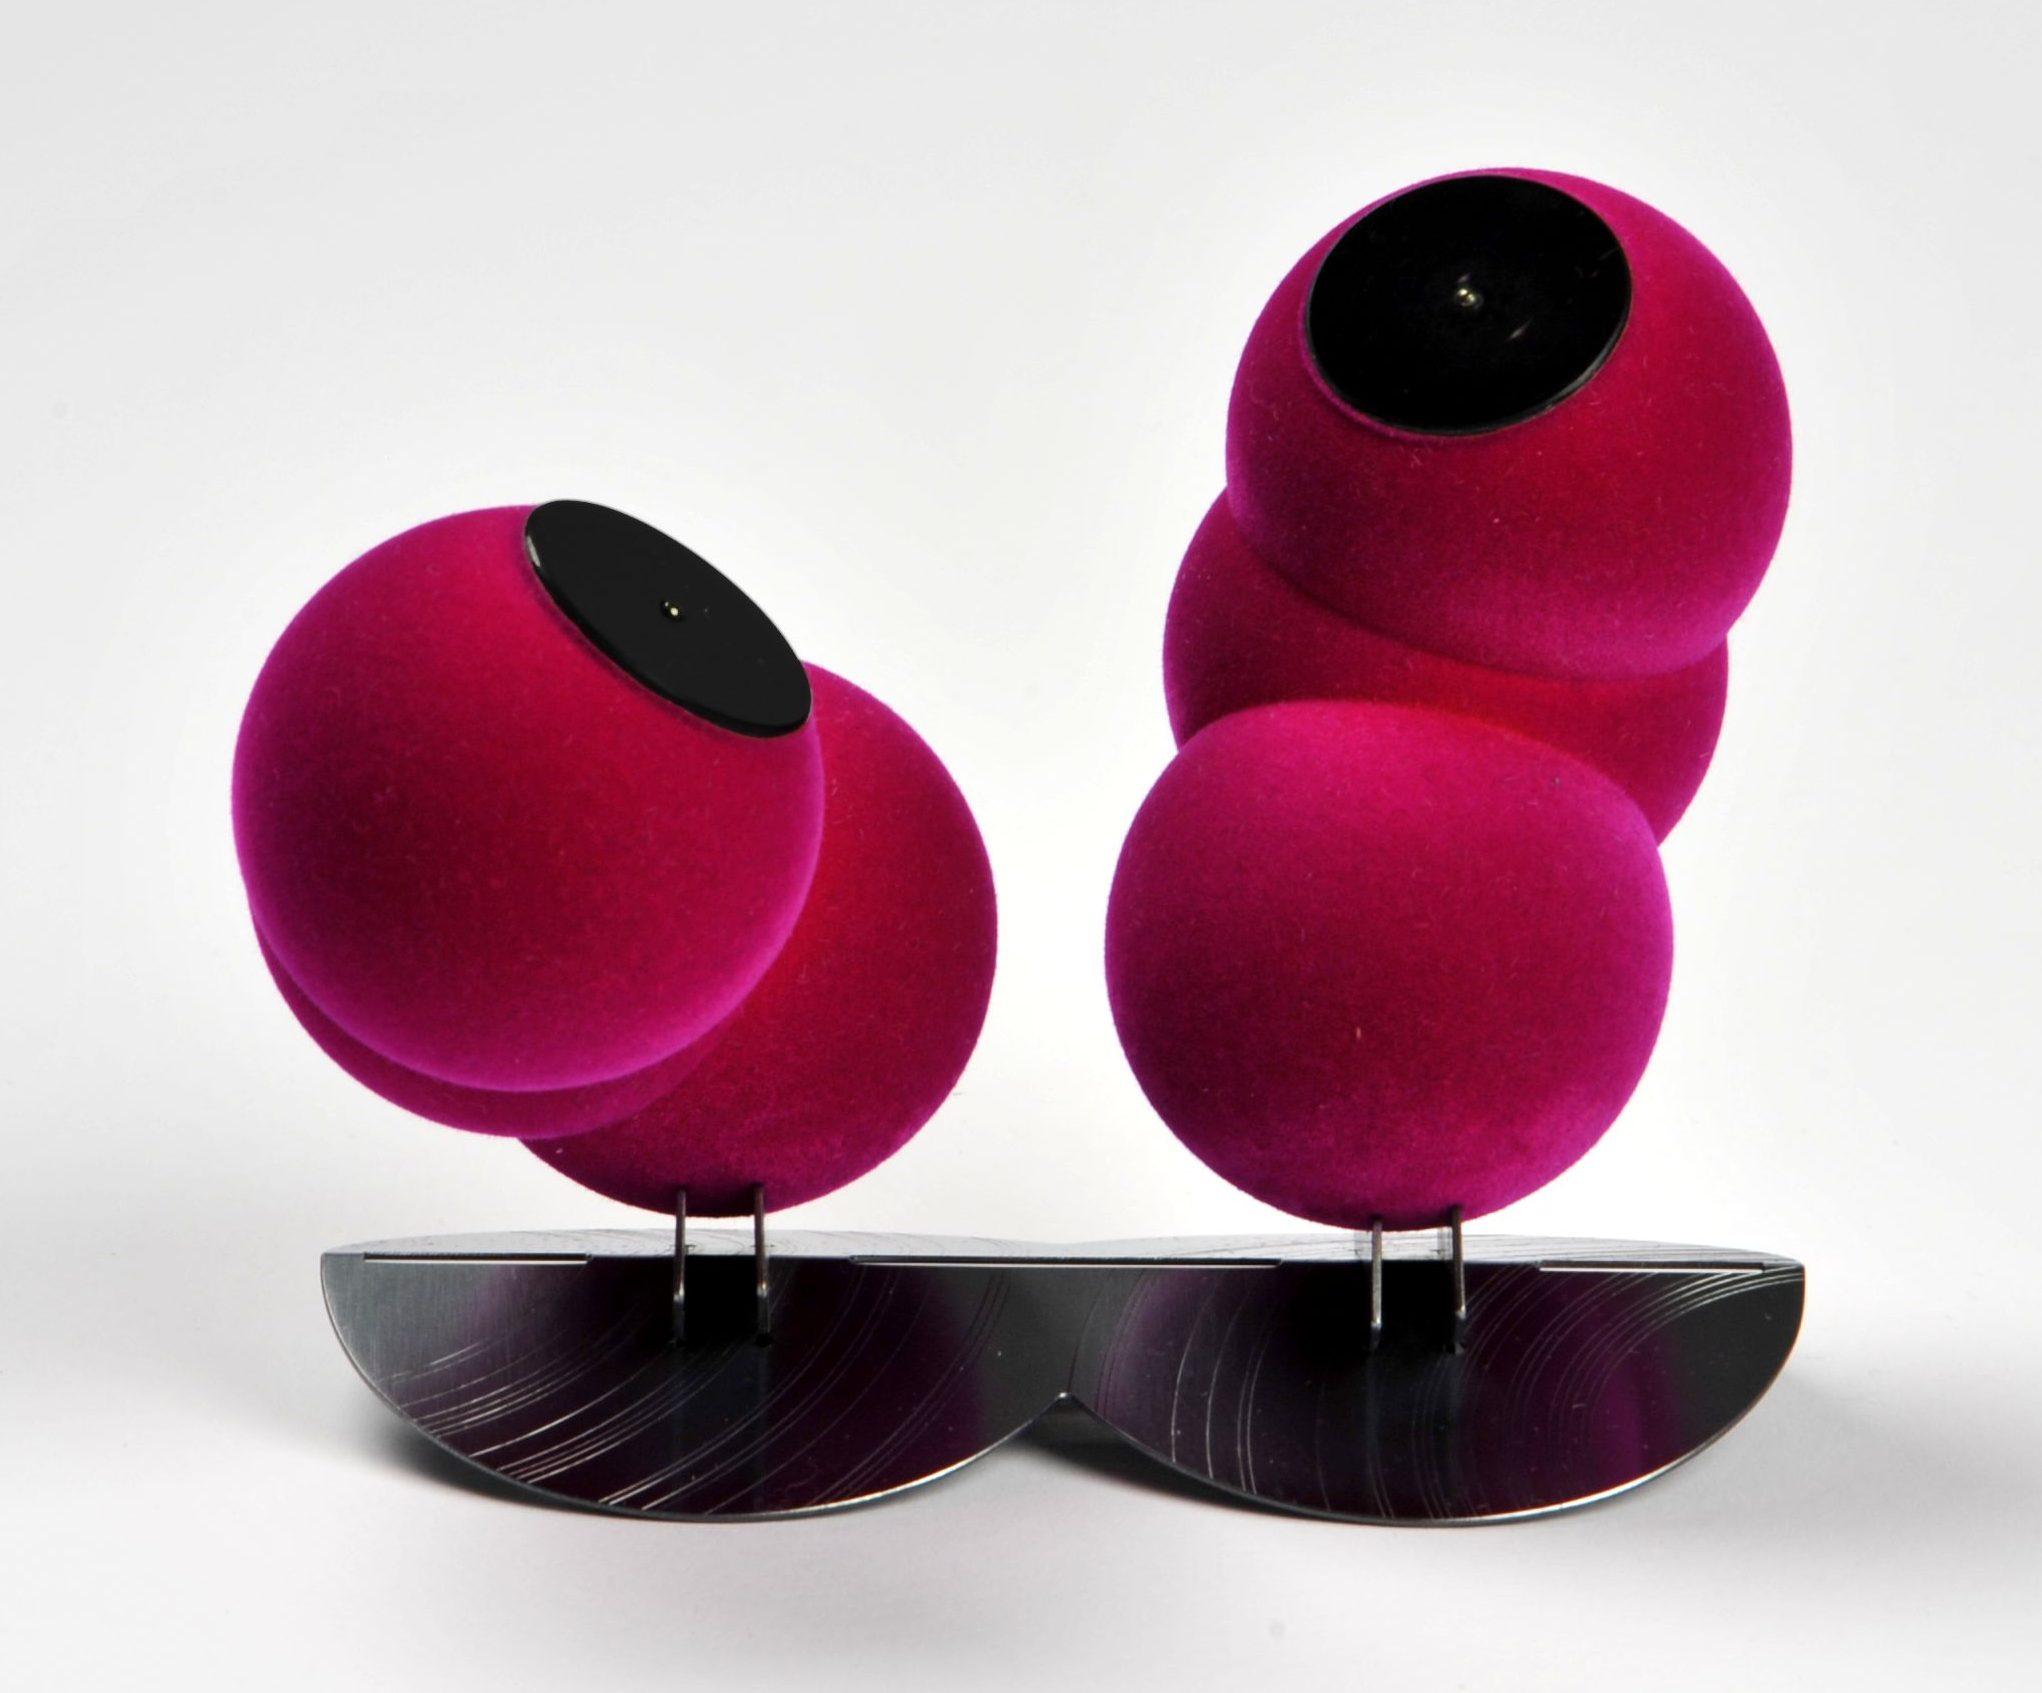 Norman Weber, Flock Balls 4.2, broche, 2014. Von Hier und Dort, 2015, alpaca, plastic, flock, staal